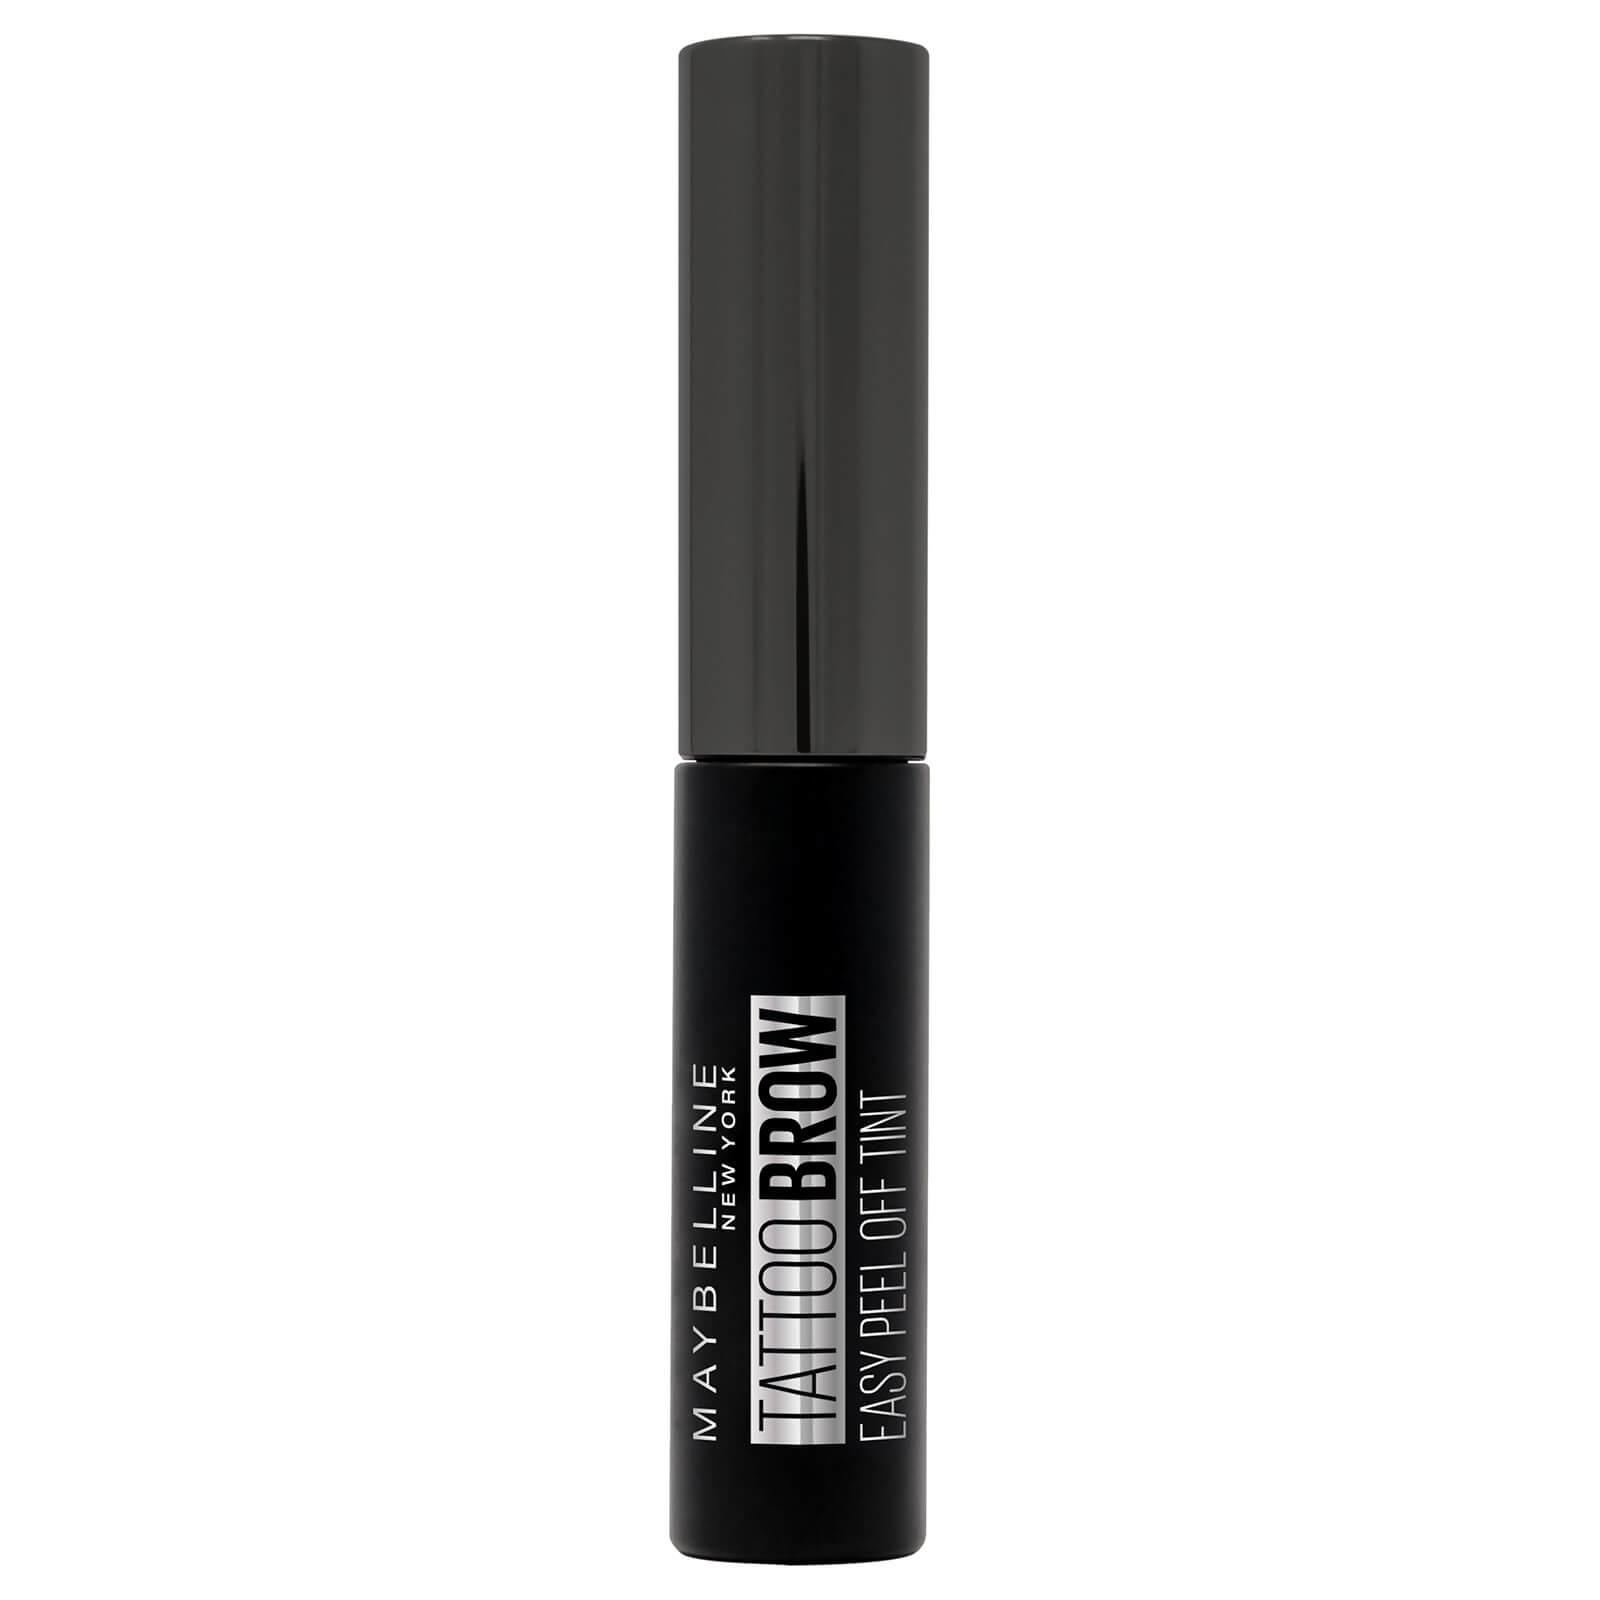 Maybelline Encre à Sourcils Peel Off Longue Tenue Tattoo Brow Maybelline (différentes teintes disponibles) - 35 Black Brown